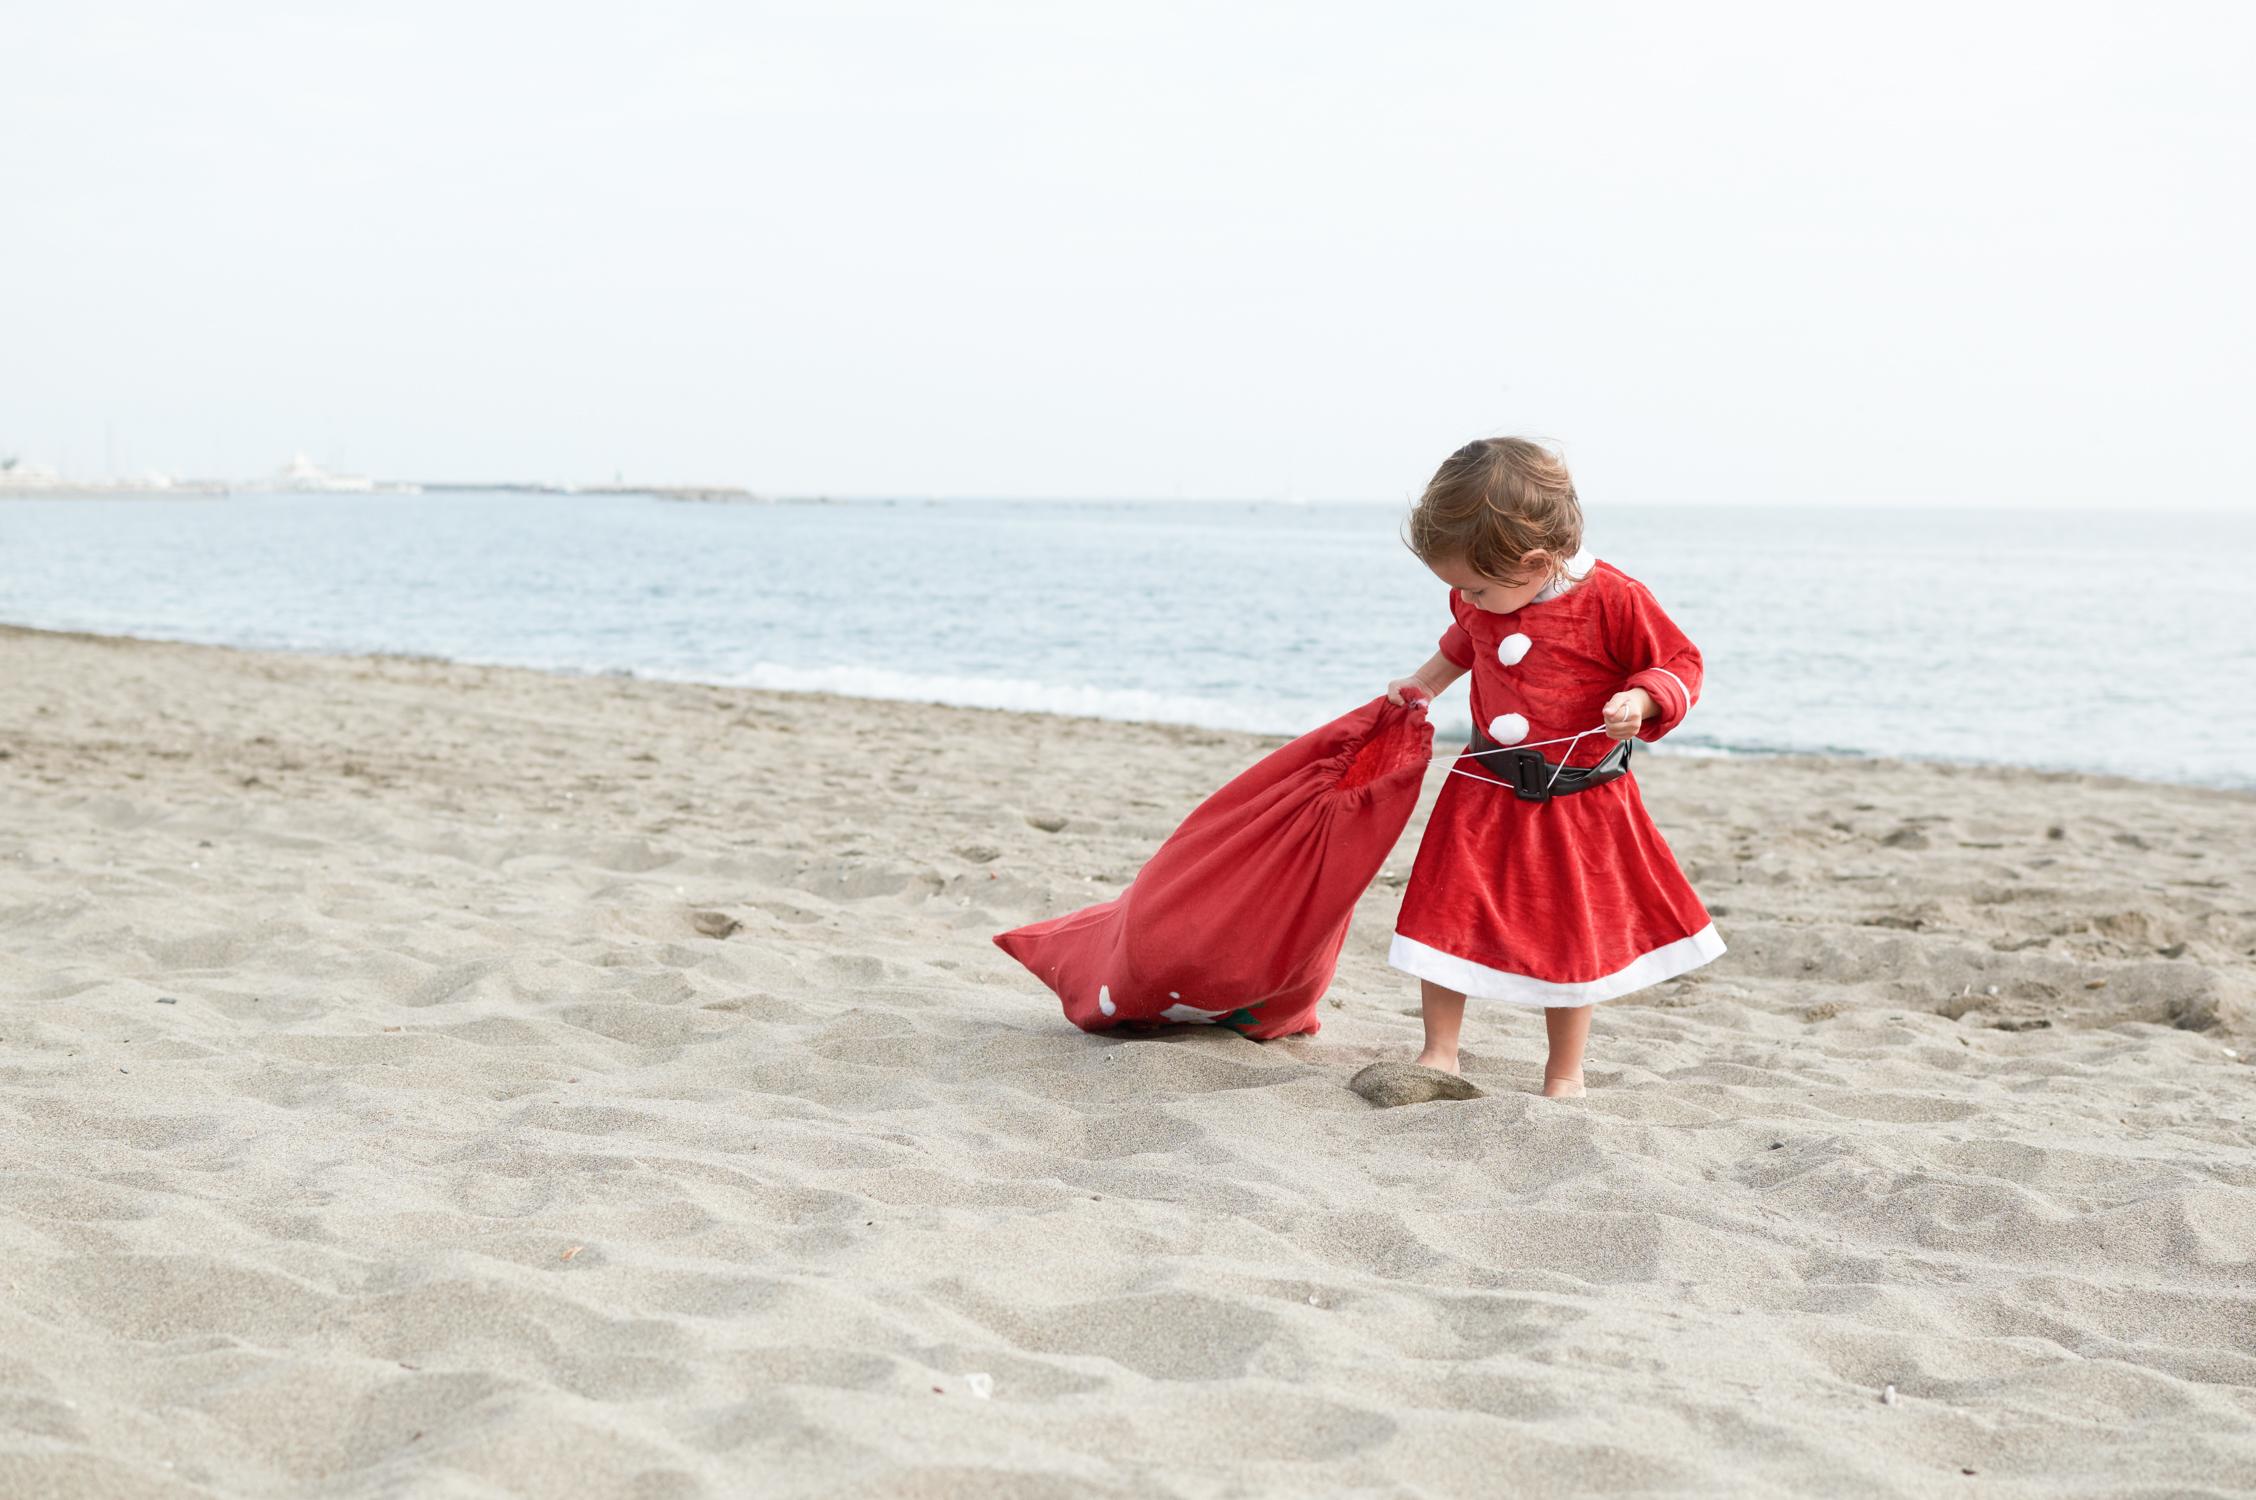 Child_photography_ideas-1